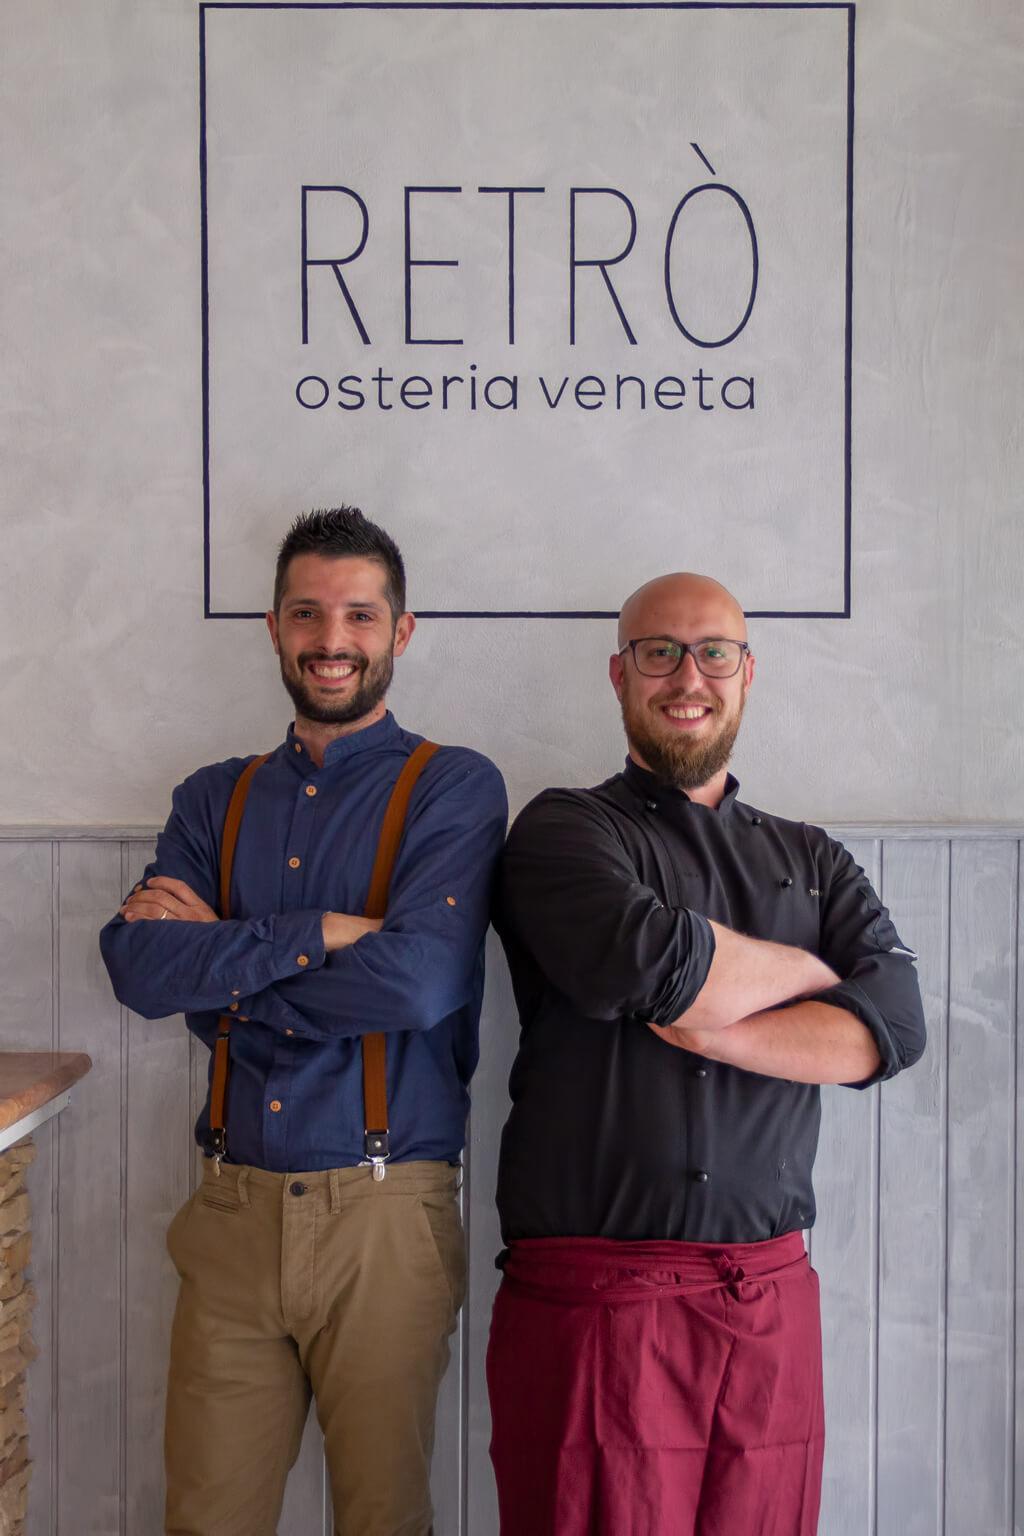 Alberto e Matteo - Retrò, Osteria Veneta